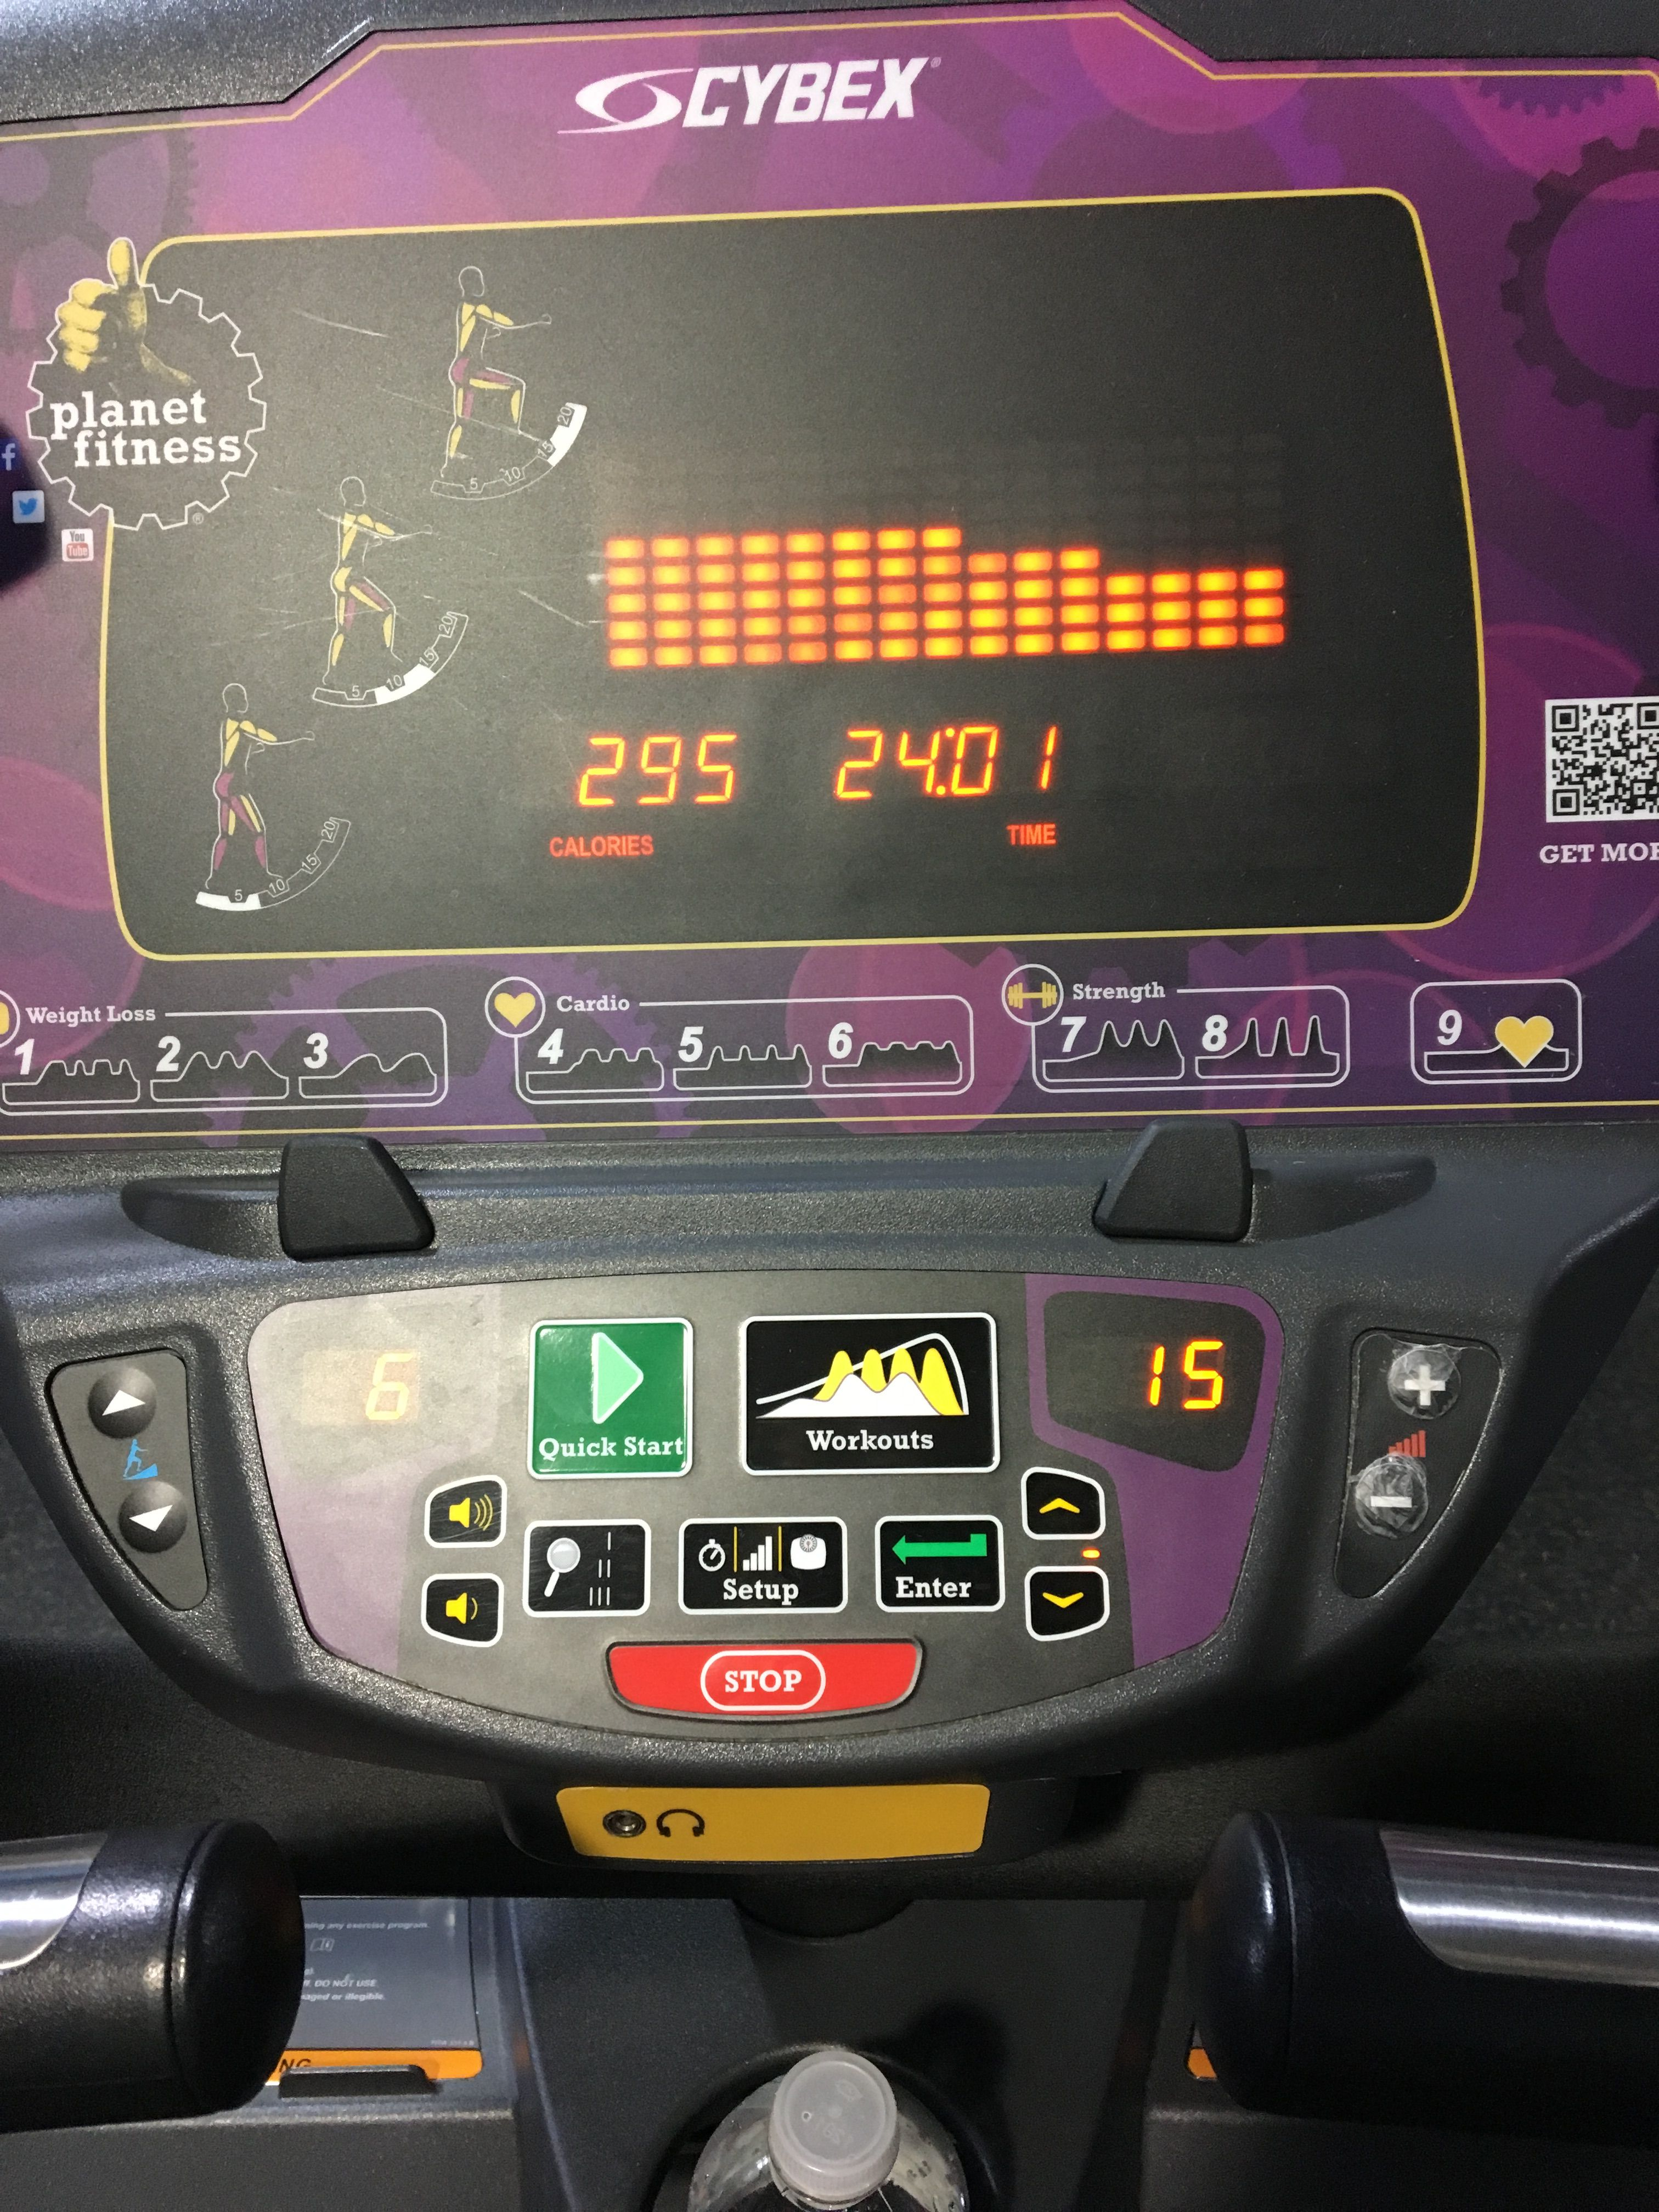 1227 elliptical arc trainer fitness workout cardio